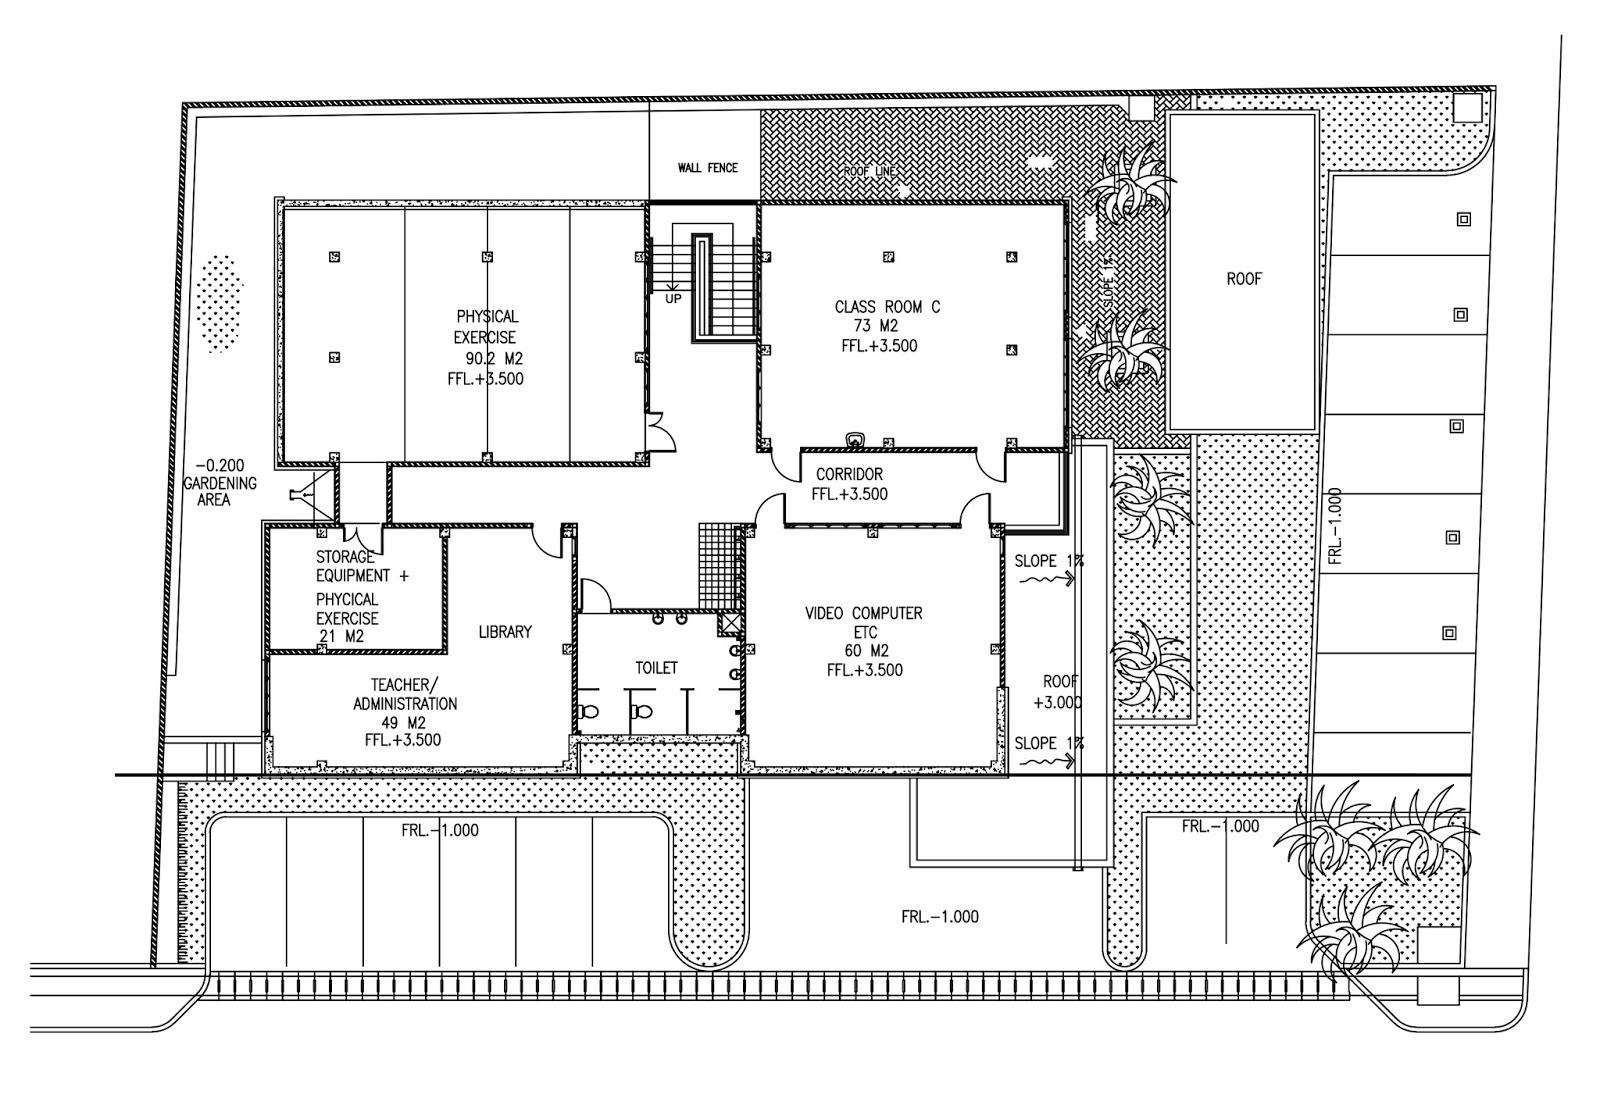 Denah Perpustakaan Sekolah Dasar Peta Dan Denah Sd N 6 Pejarakan Gambar Sketsa Sekolah Dasar